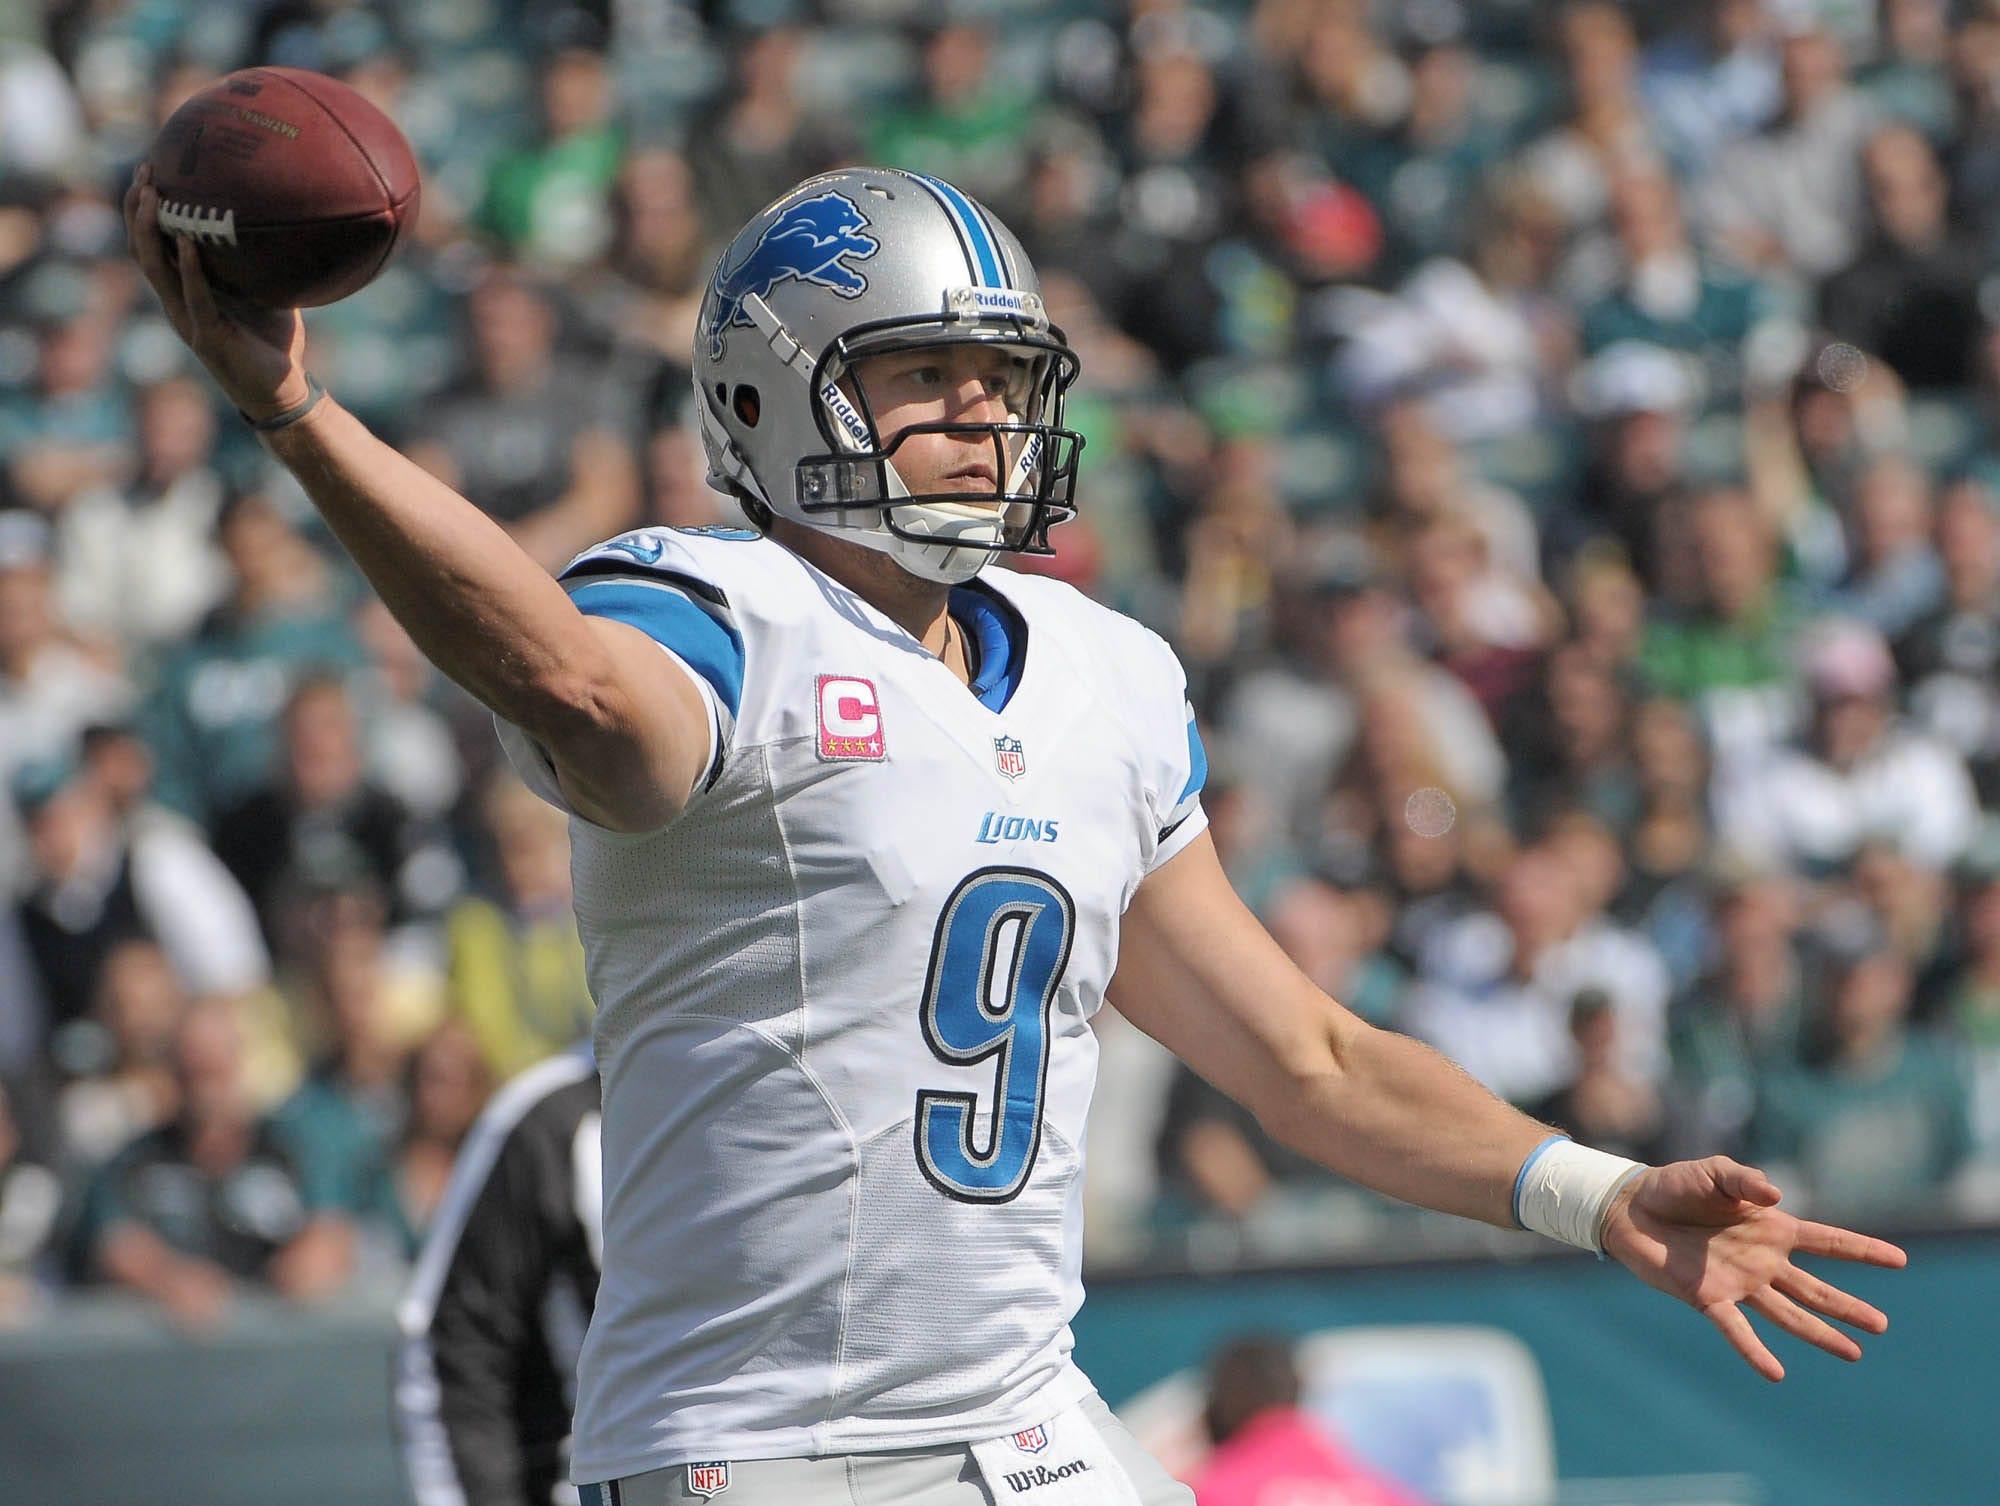 6. Matthew Stafford, Detroit Lions